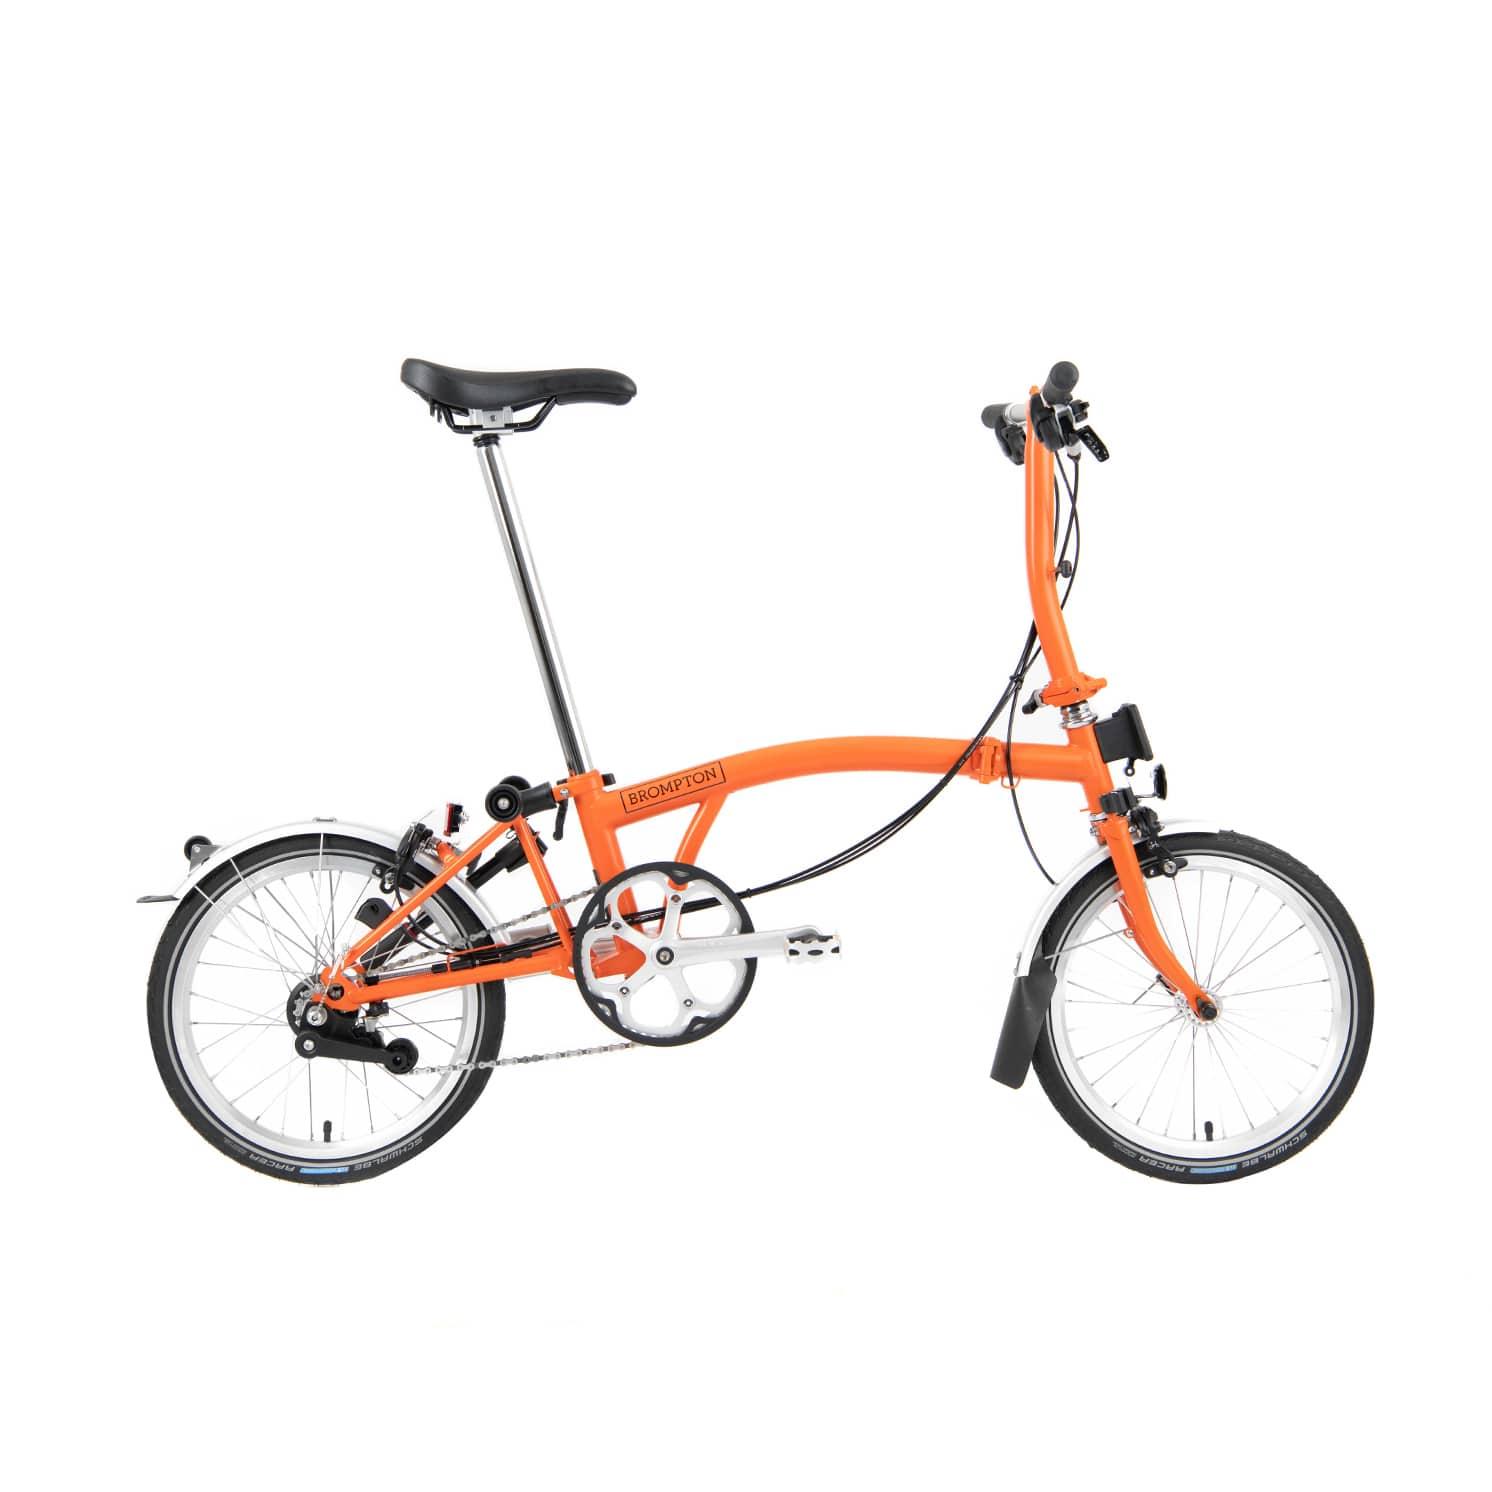 BROMPTON ( ブロンプトン ) 折りたたみ自転車 21年モデル M6R オレンジ